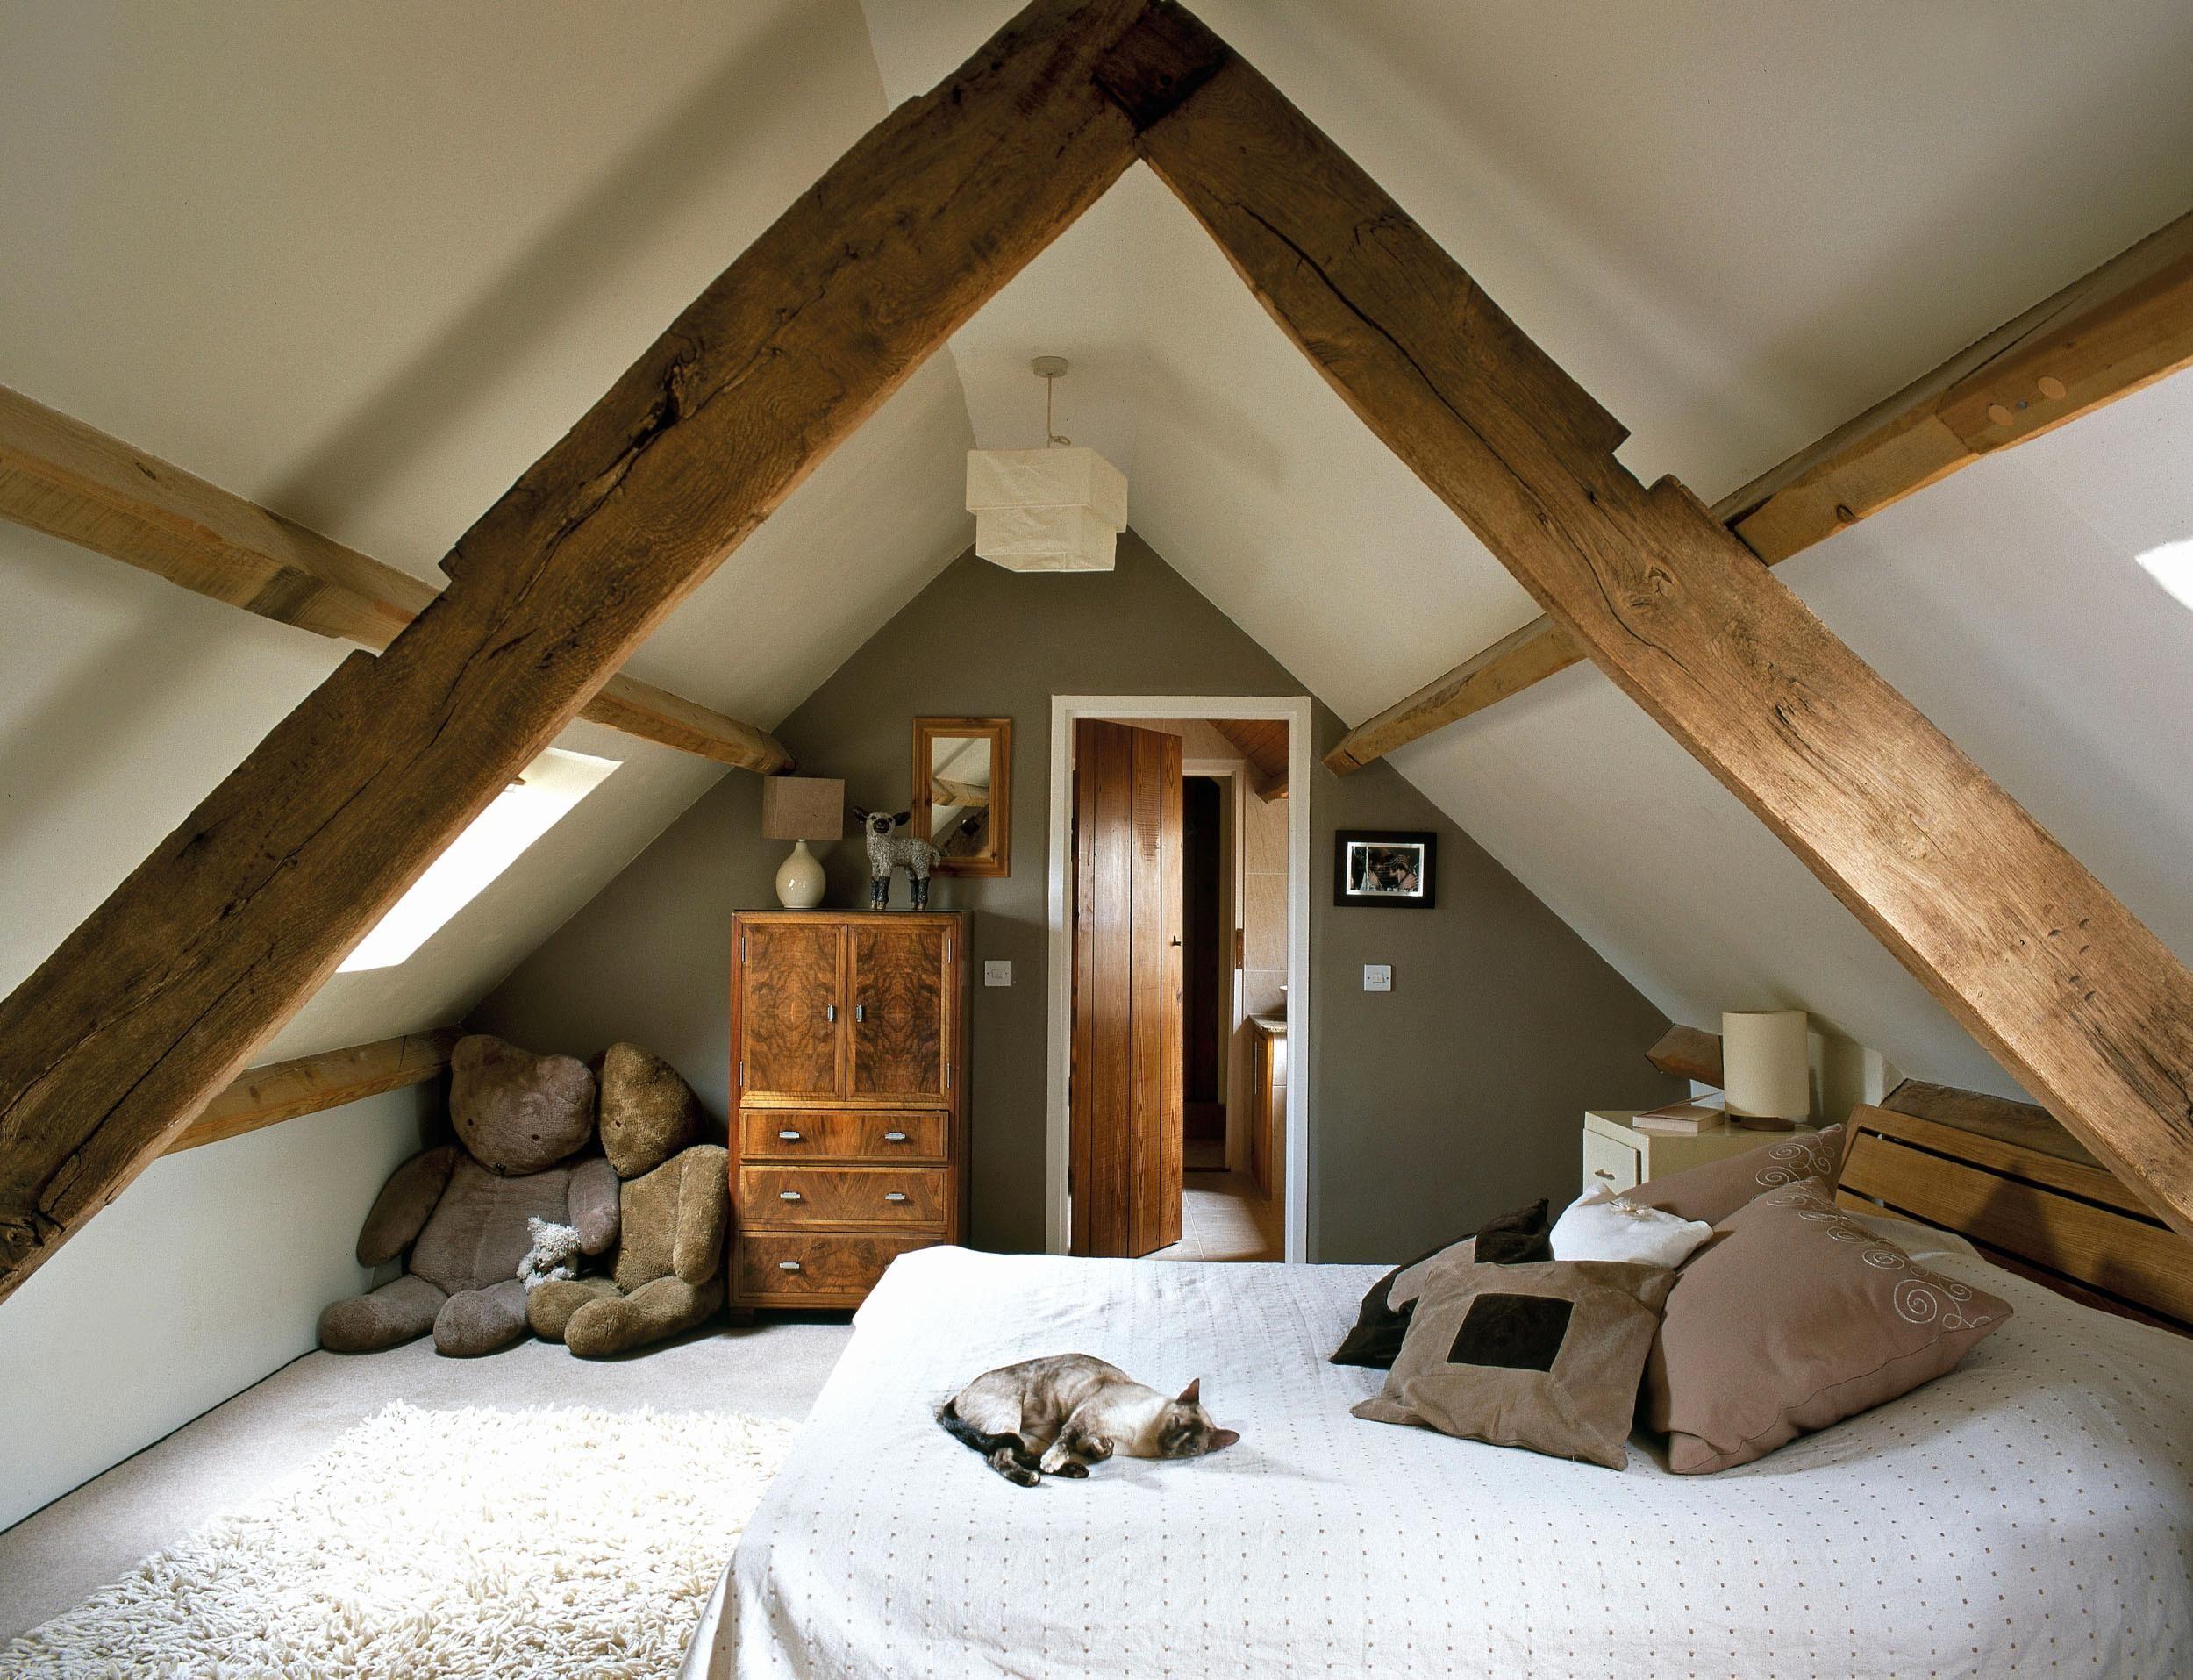 8 Schlafzimmer Ideen Dachboden Bedroom Layouts Bedroom Photos Country Bedroom